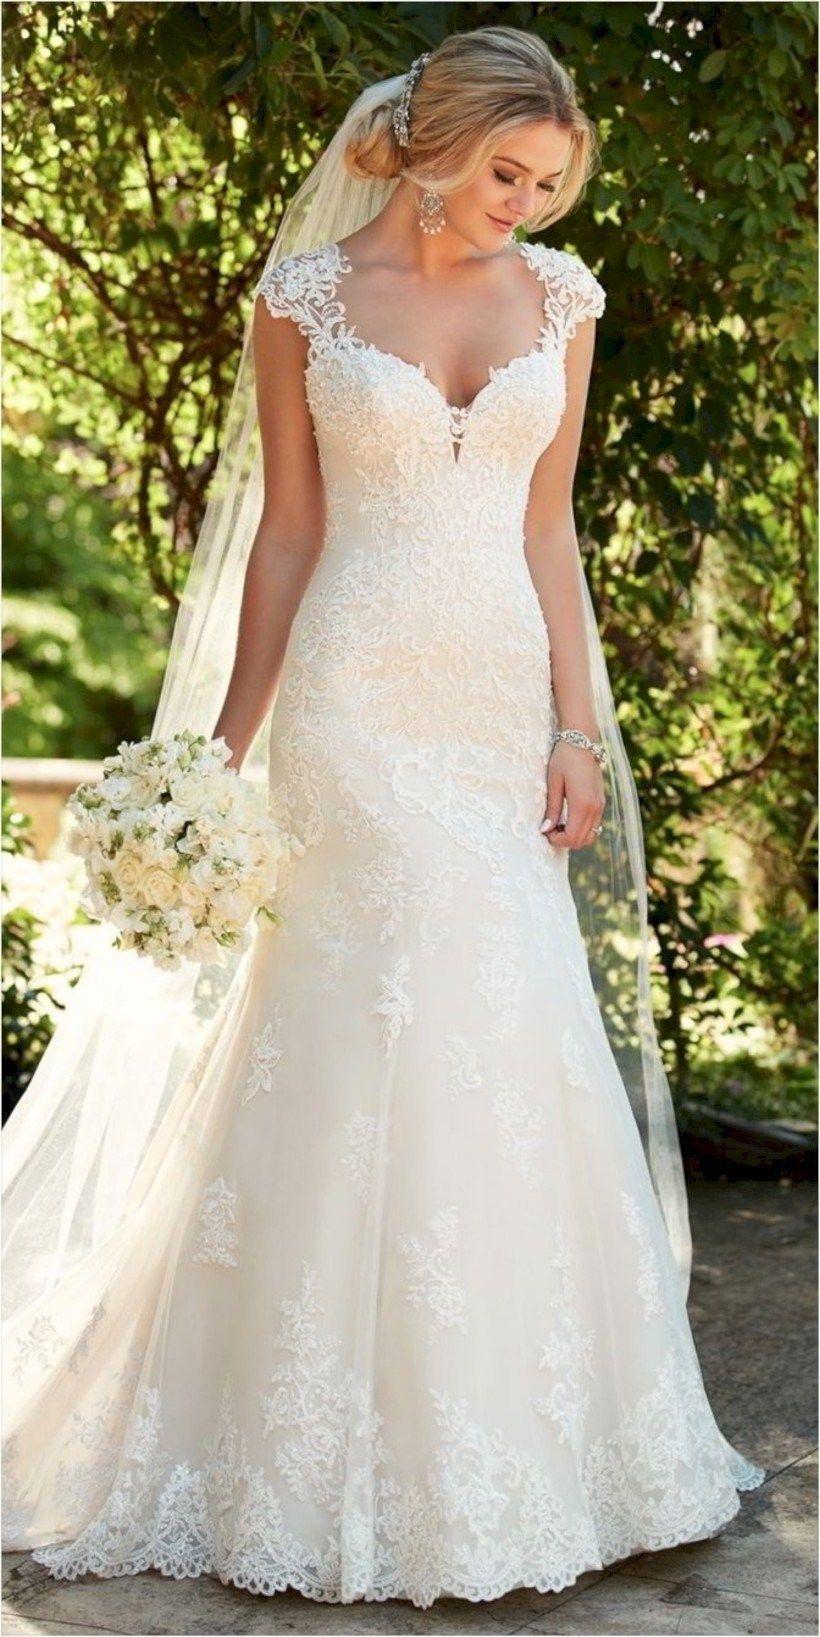 44 Latest Trend Wedding Dress Inspiration Ideas Spring